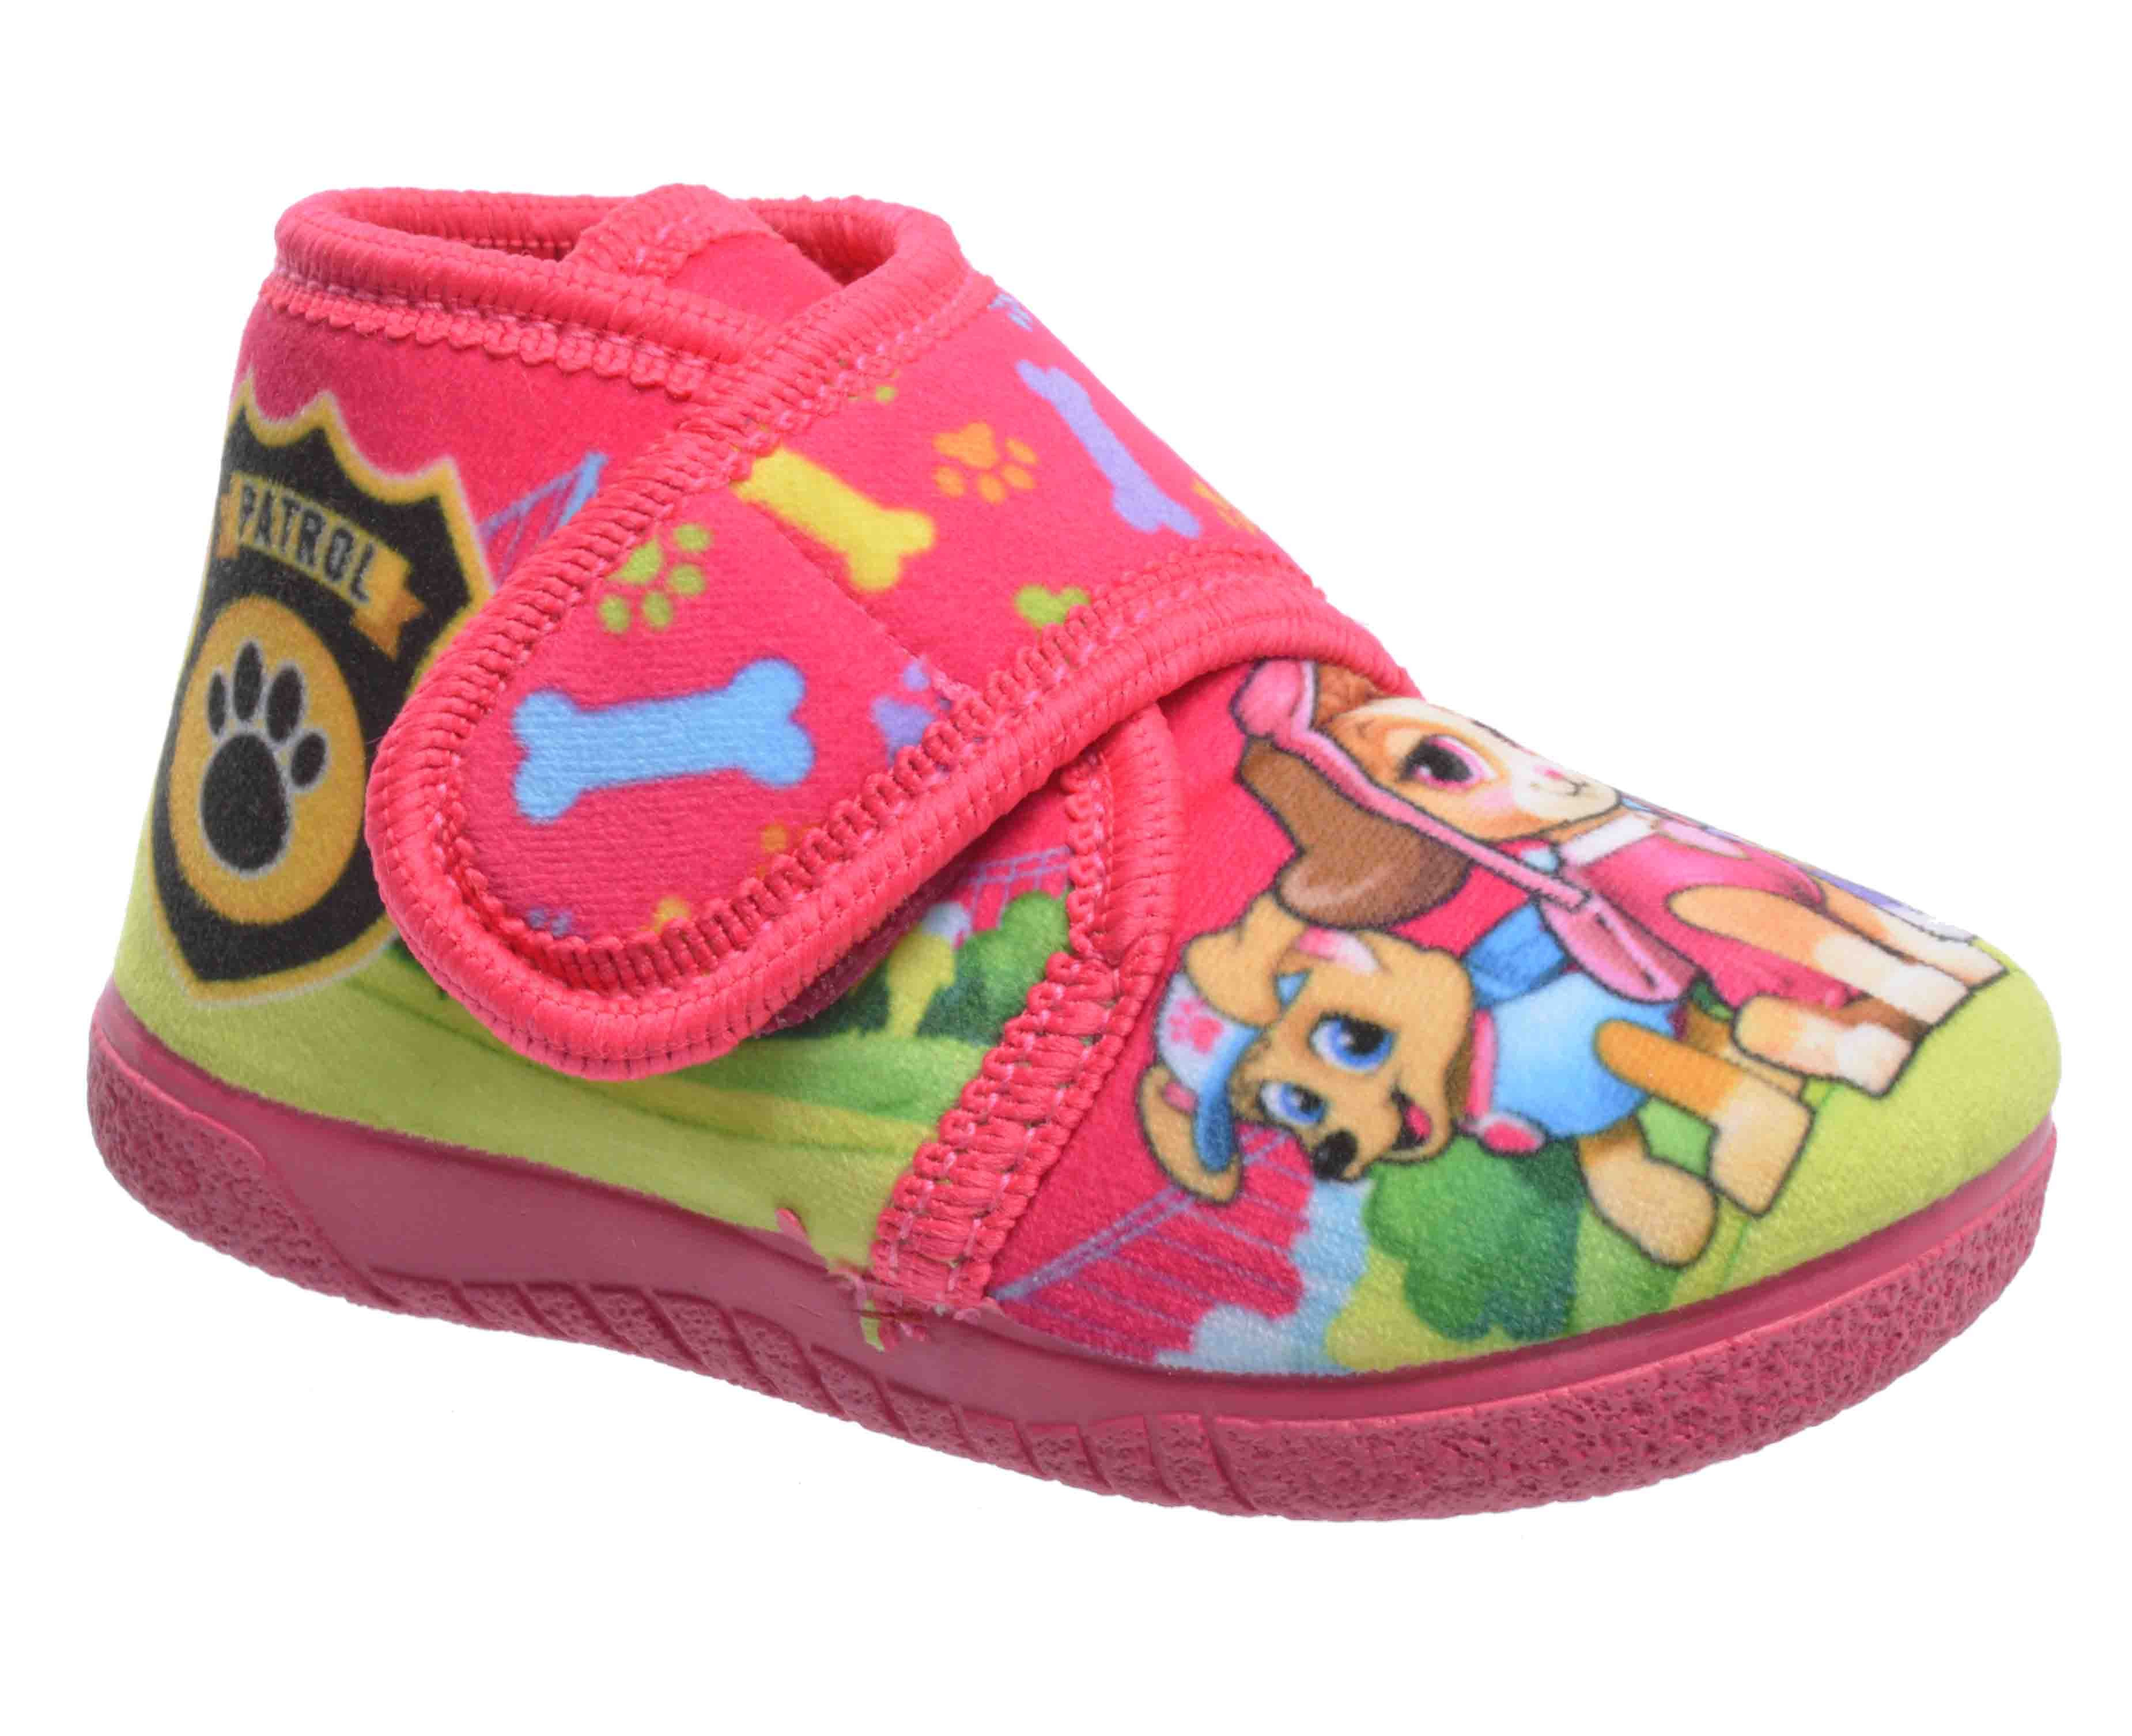 65c59500219 Antrin 14000 Φούξια | Apostolidis Shoes